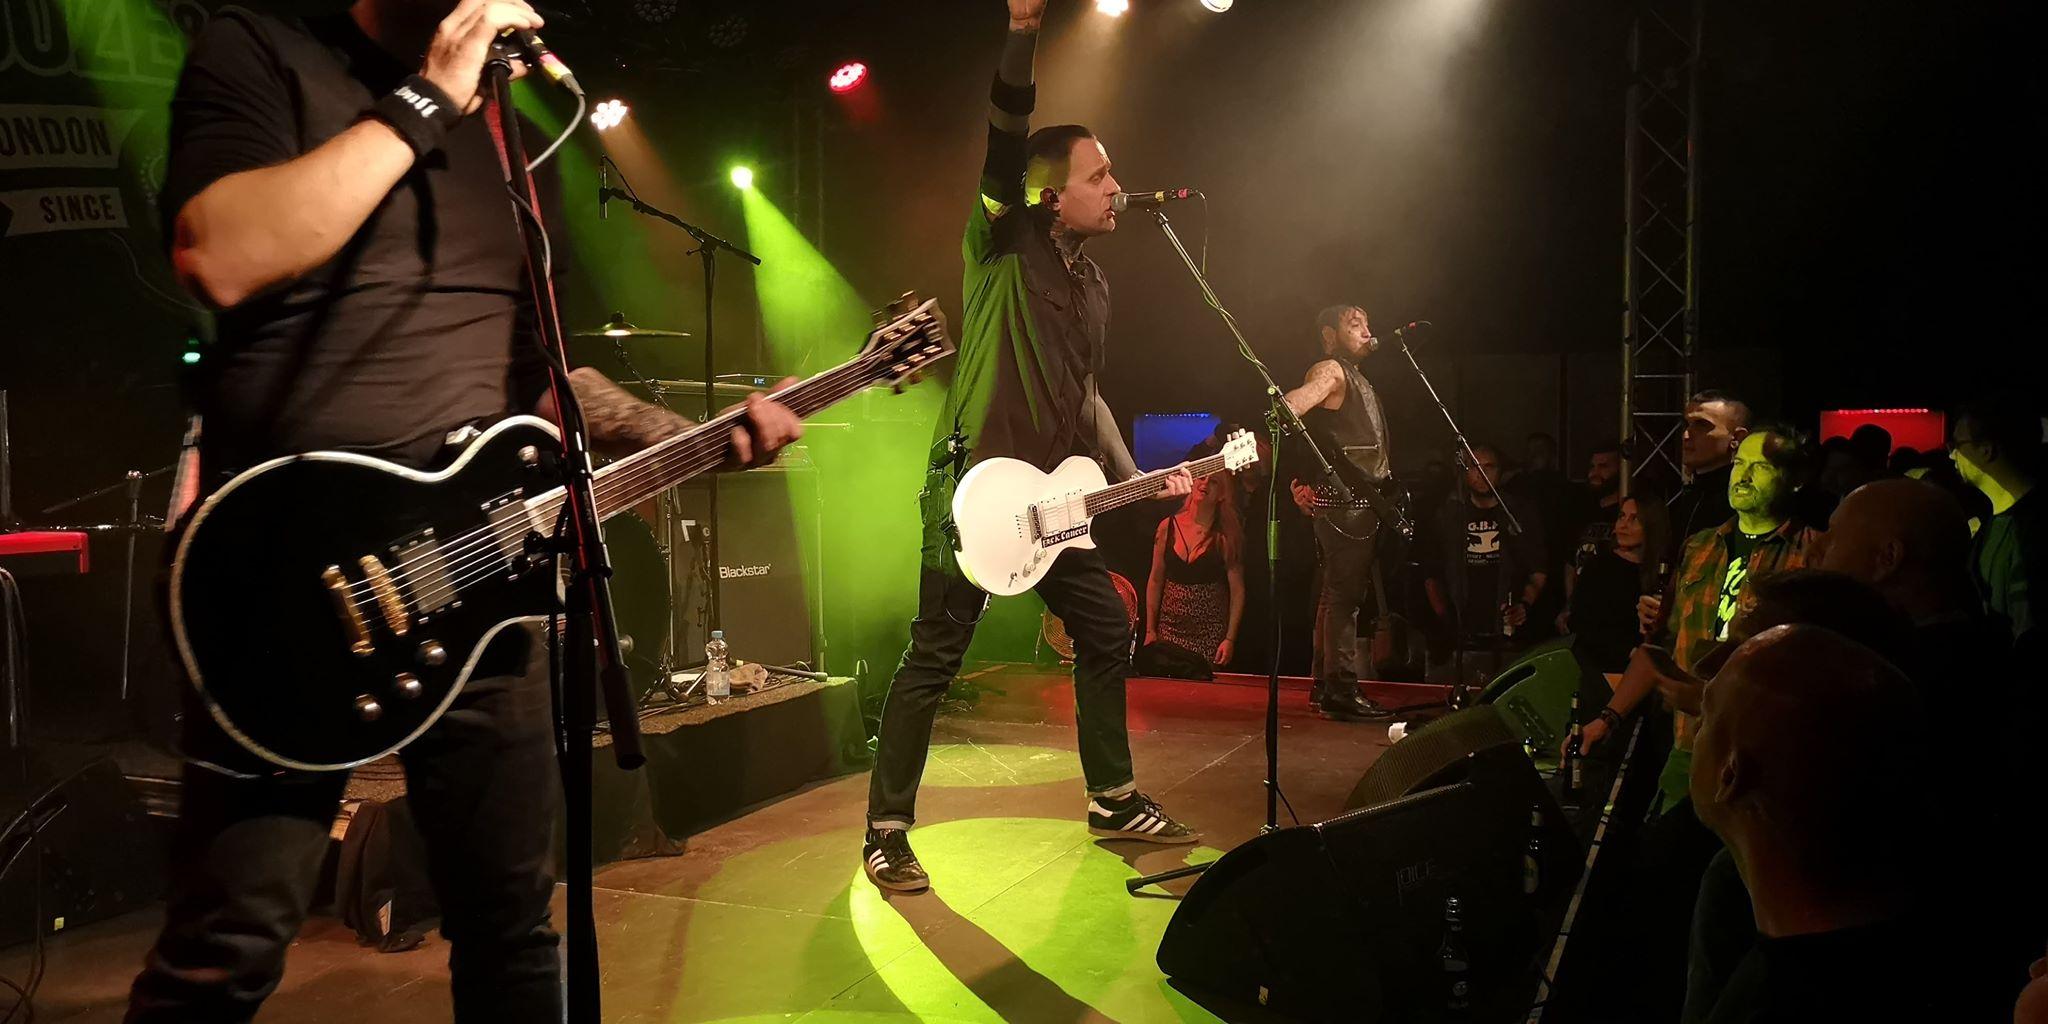 Booze & Glory am 07. November 2018 im Das Bett in Frankfurt